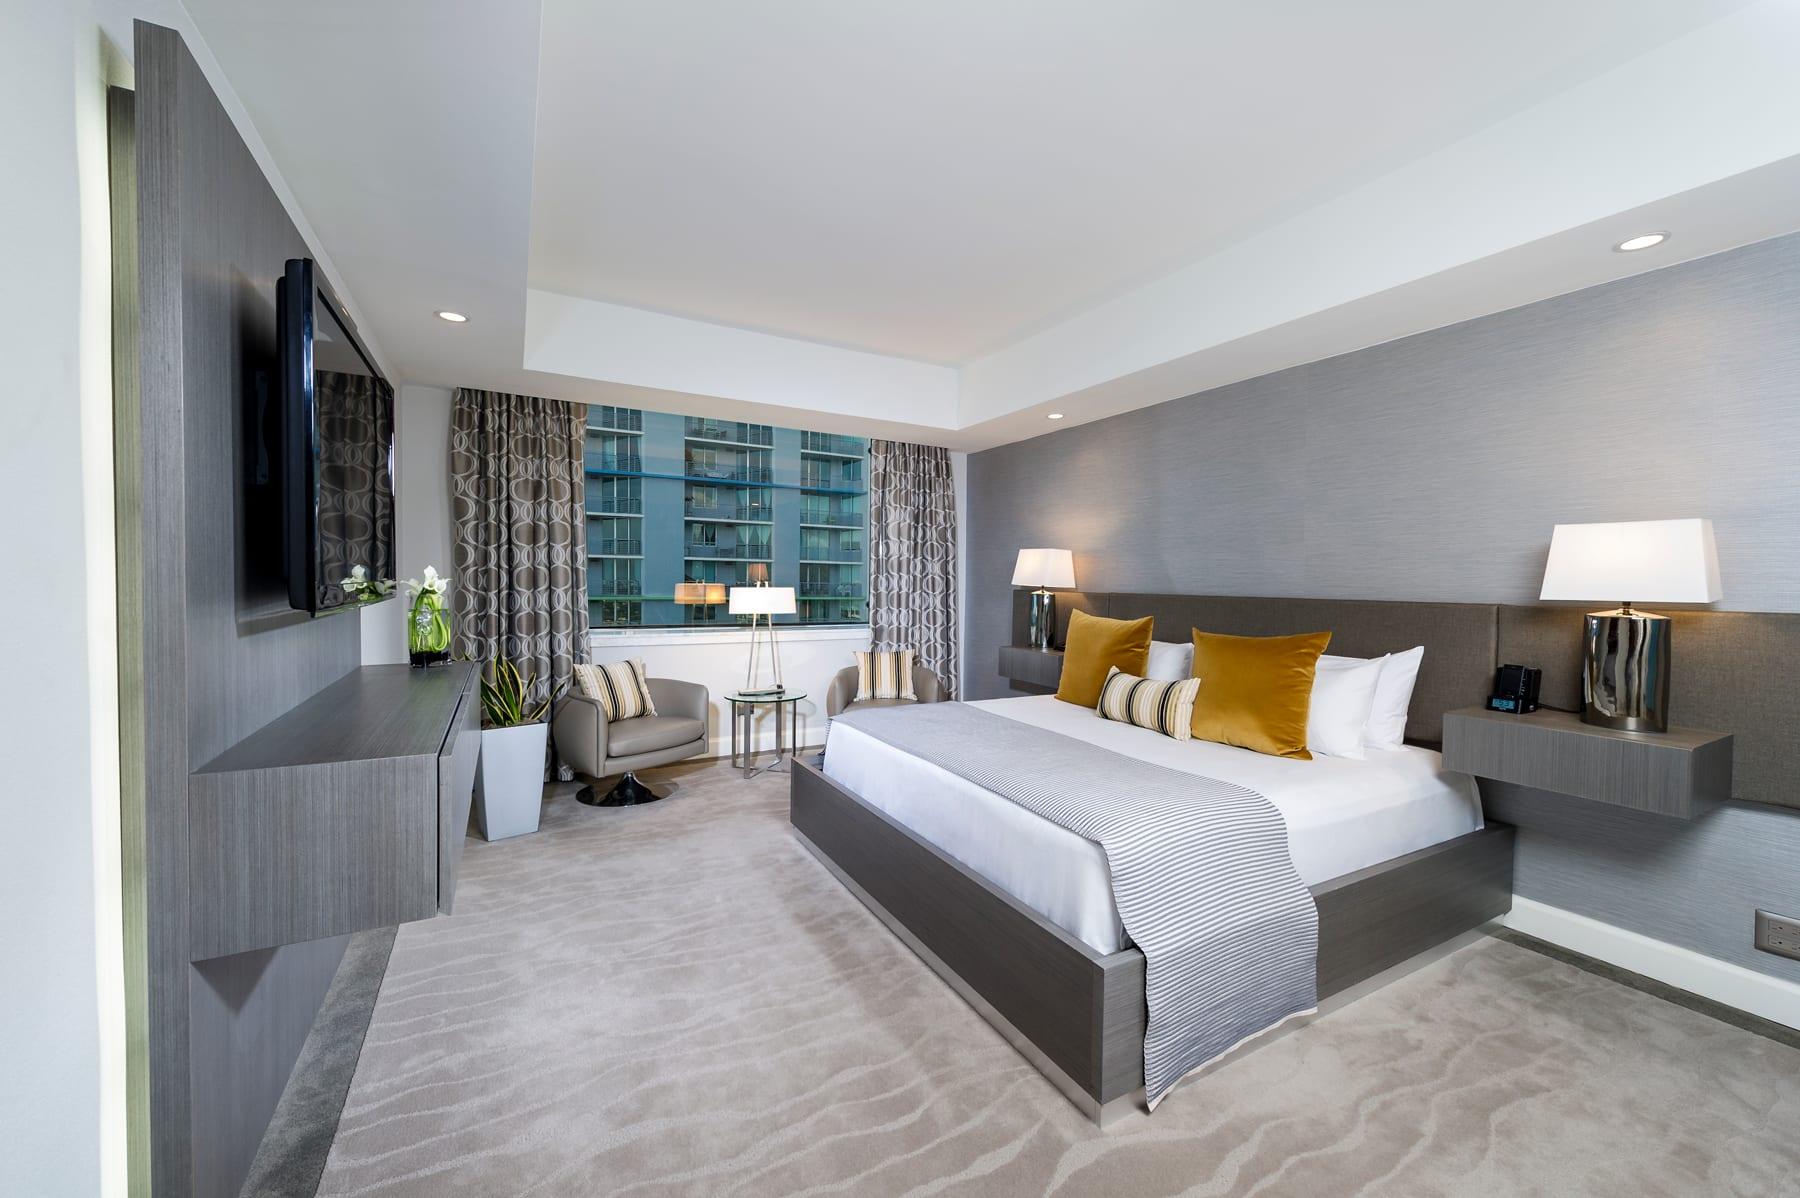 Intercontinental Hotel   Room 1   Miami, FL   Hospitality   Interior Designers